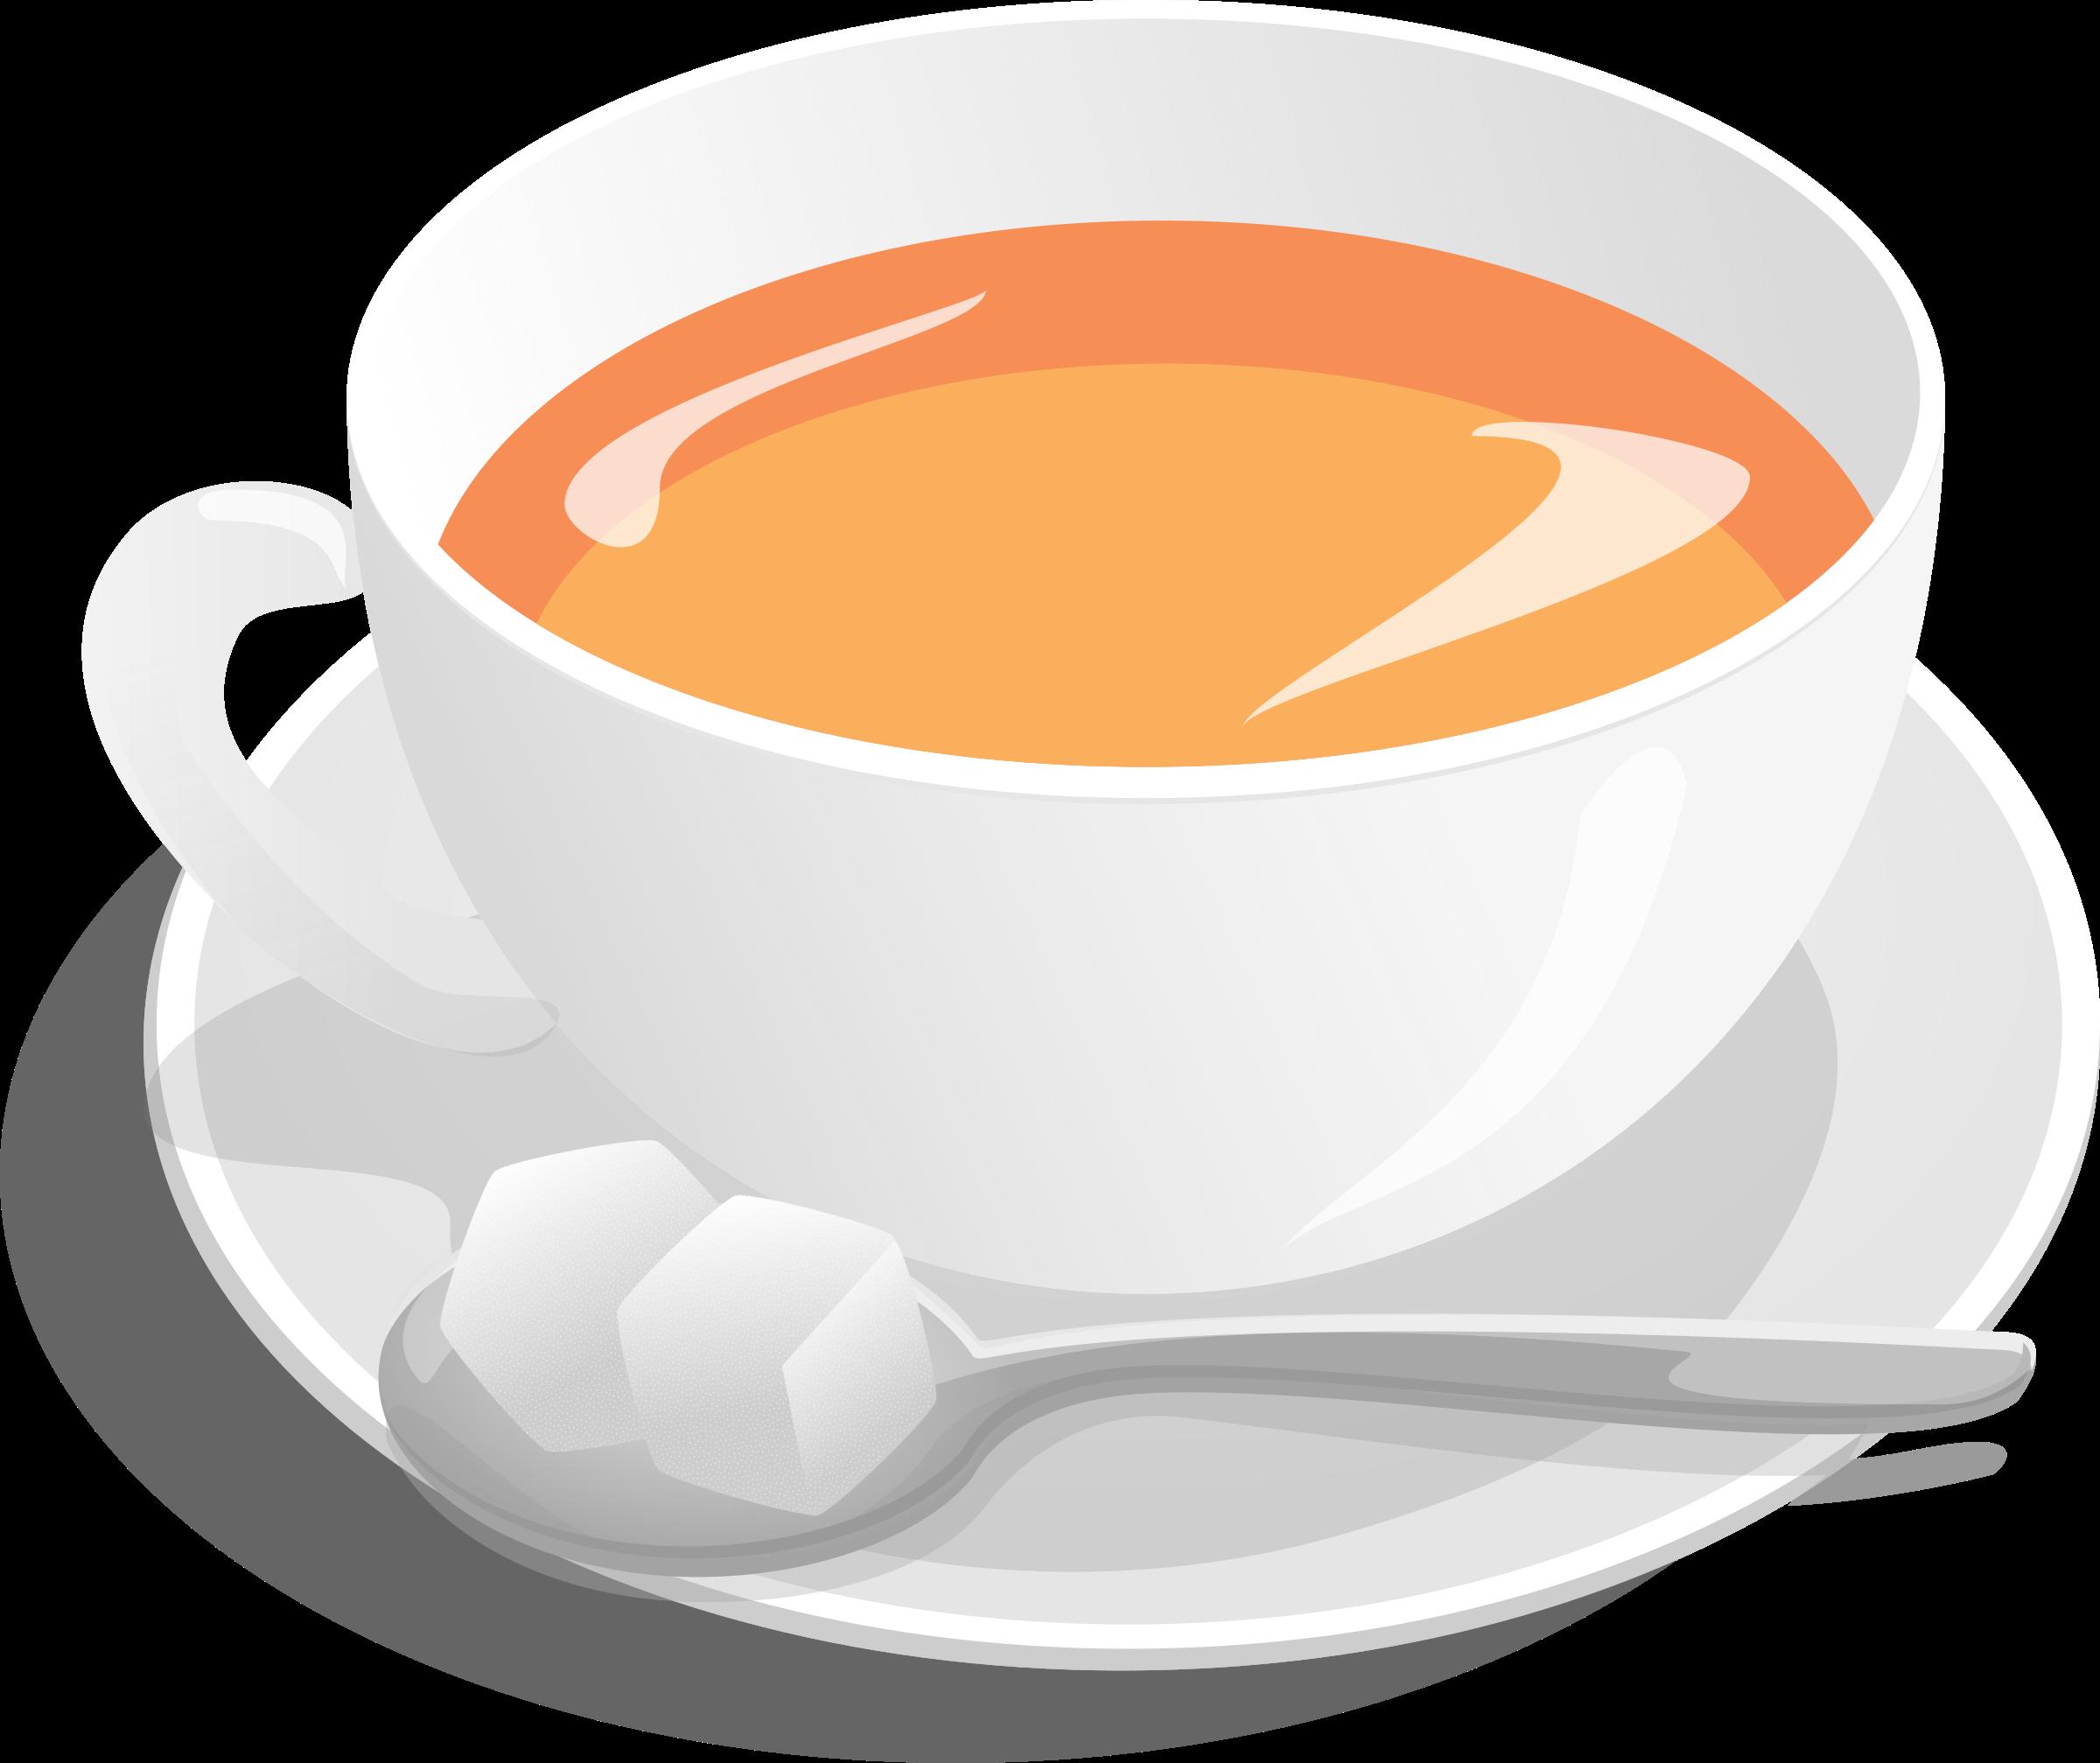 Teacup big image png. Clipart milk tea glass